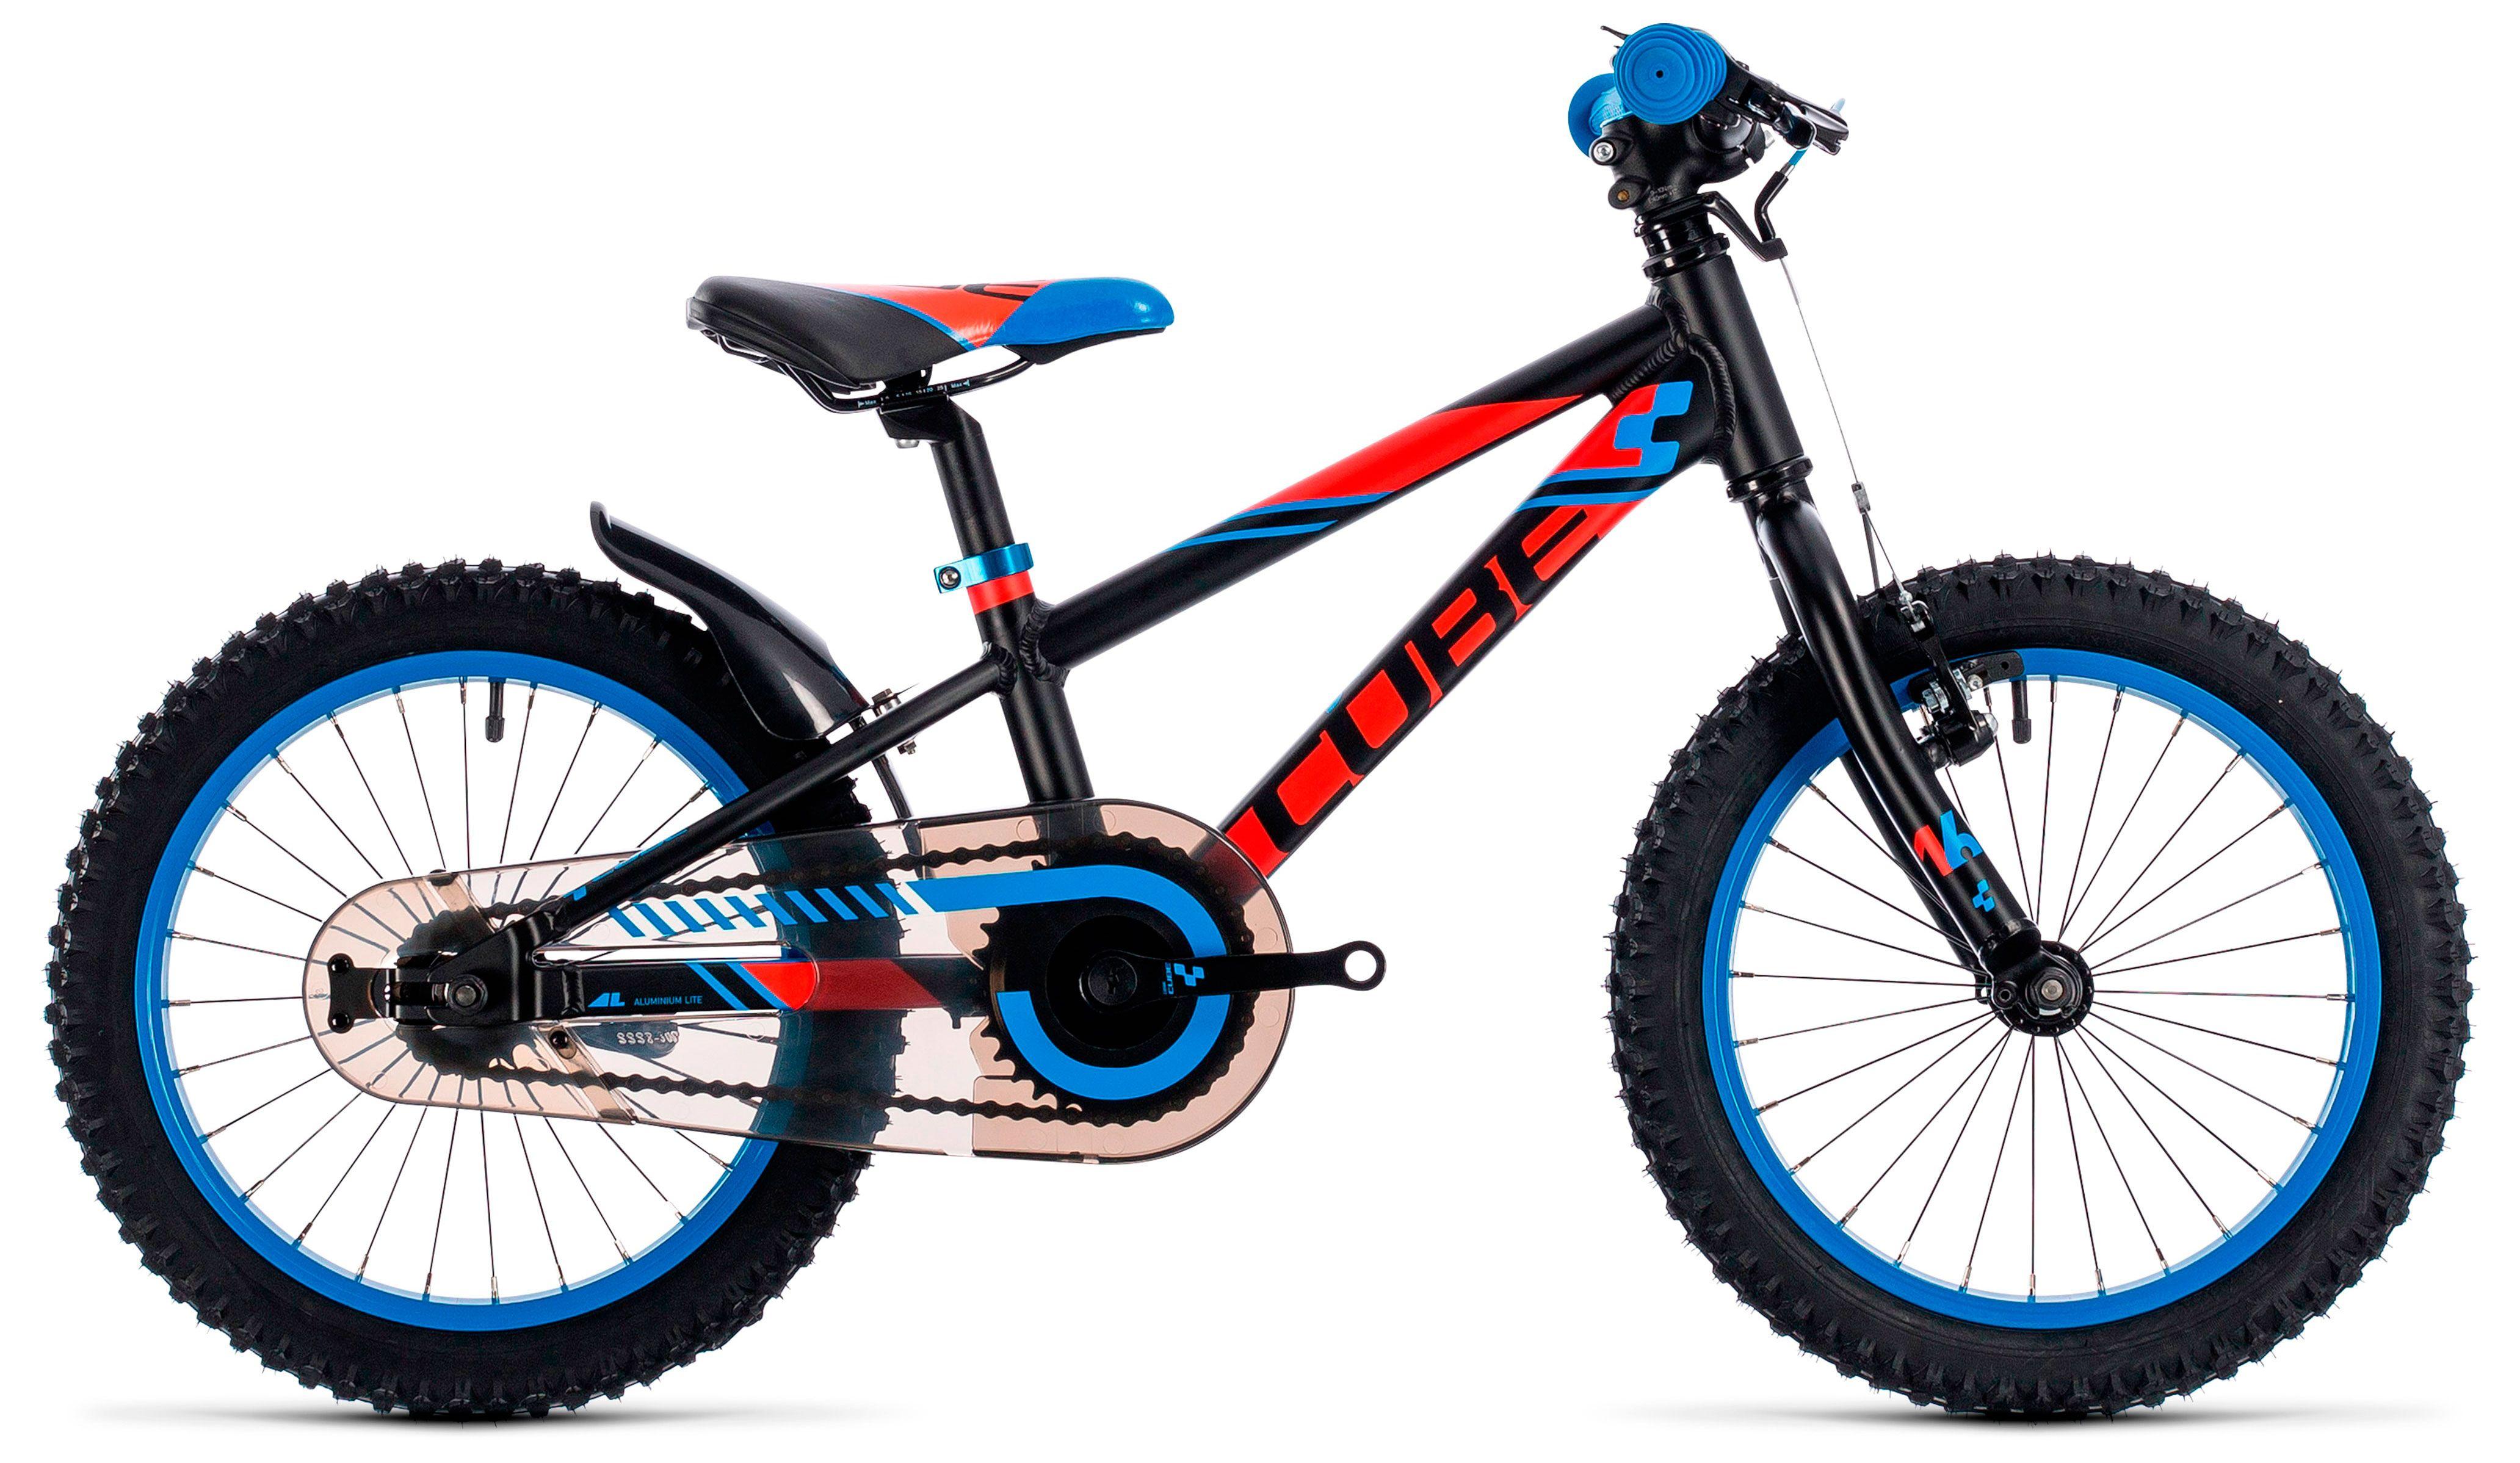 Велосипед Cube KID 160 2018 велосипед cube kid 240 street 2015